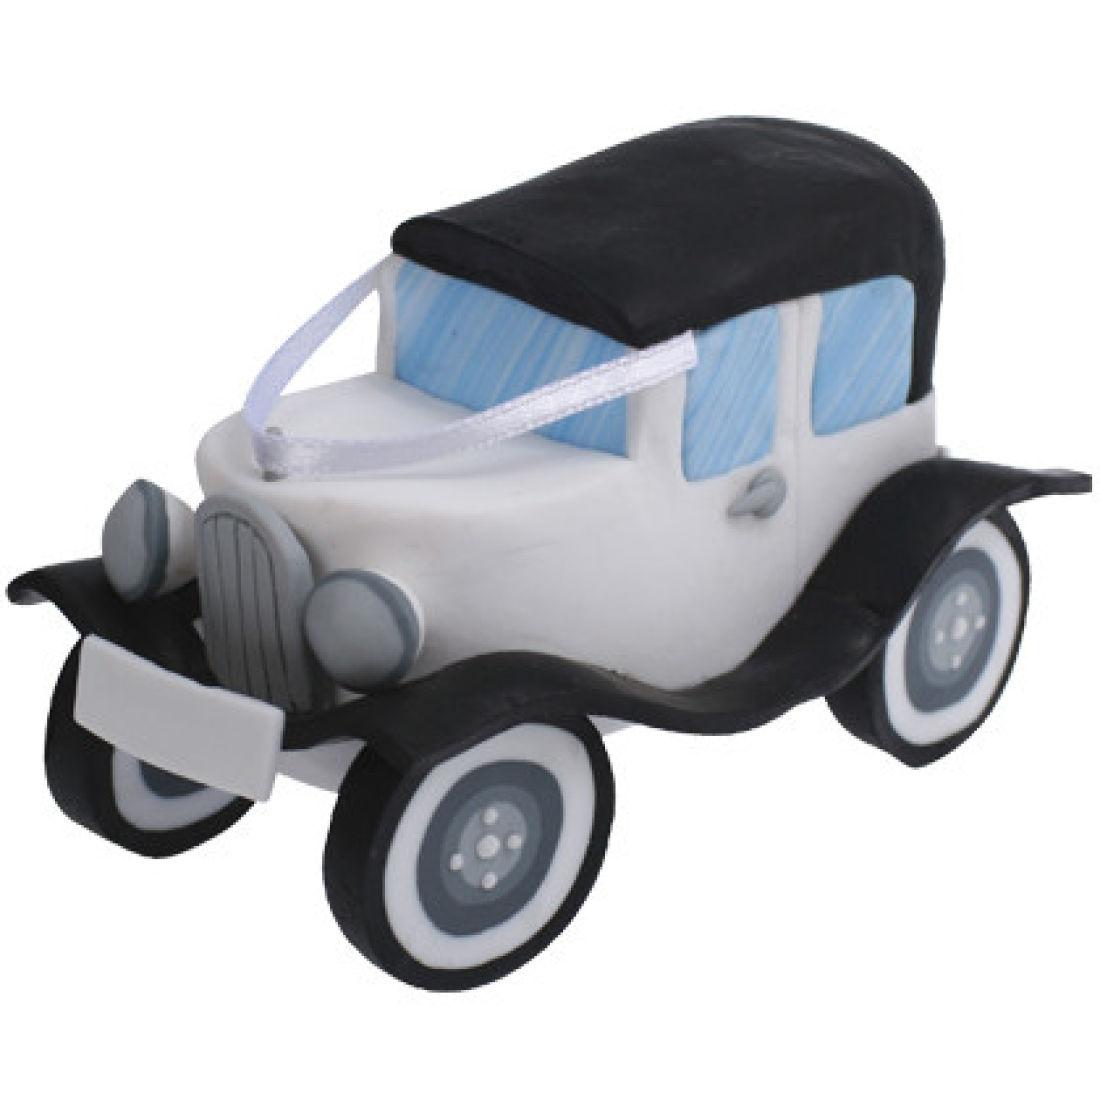 Claydough Wedding Car Cake Topper | Squires Kitchen Shop